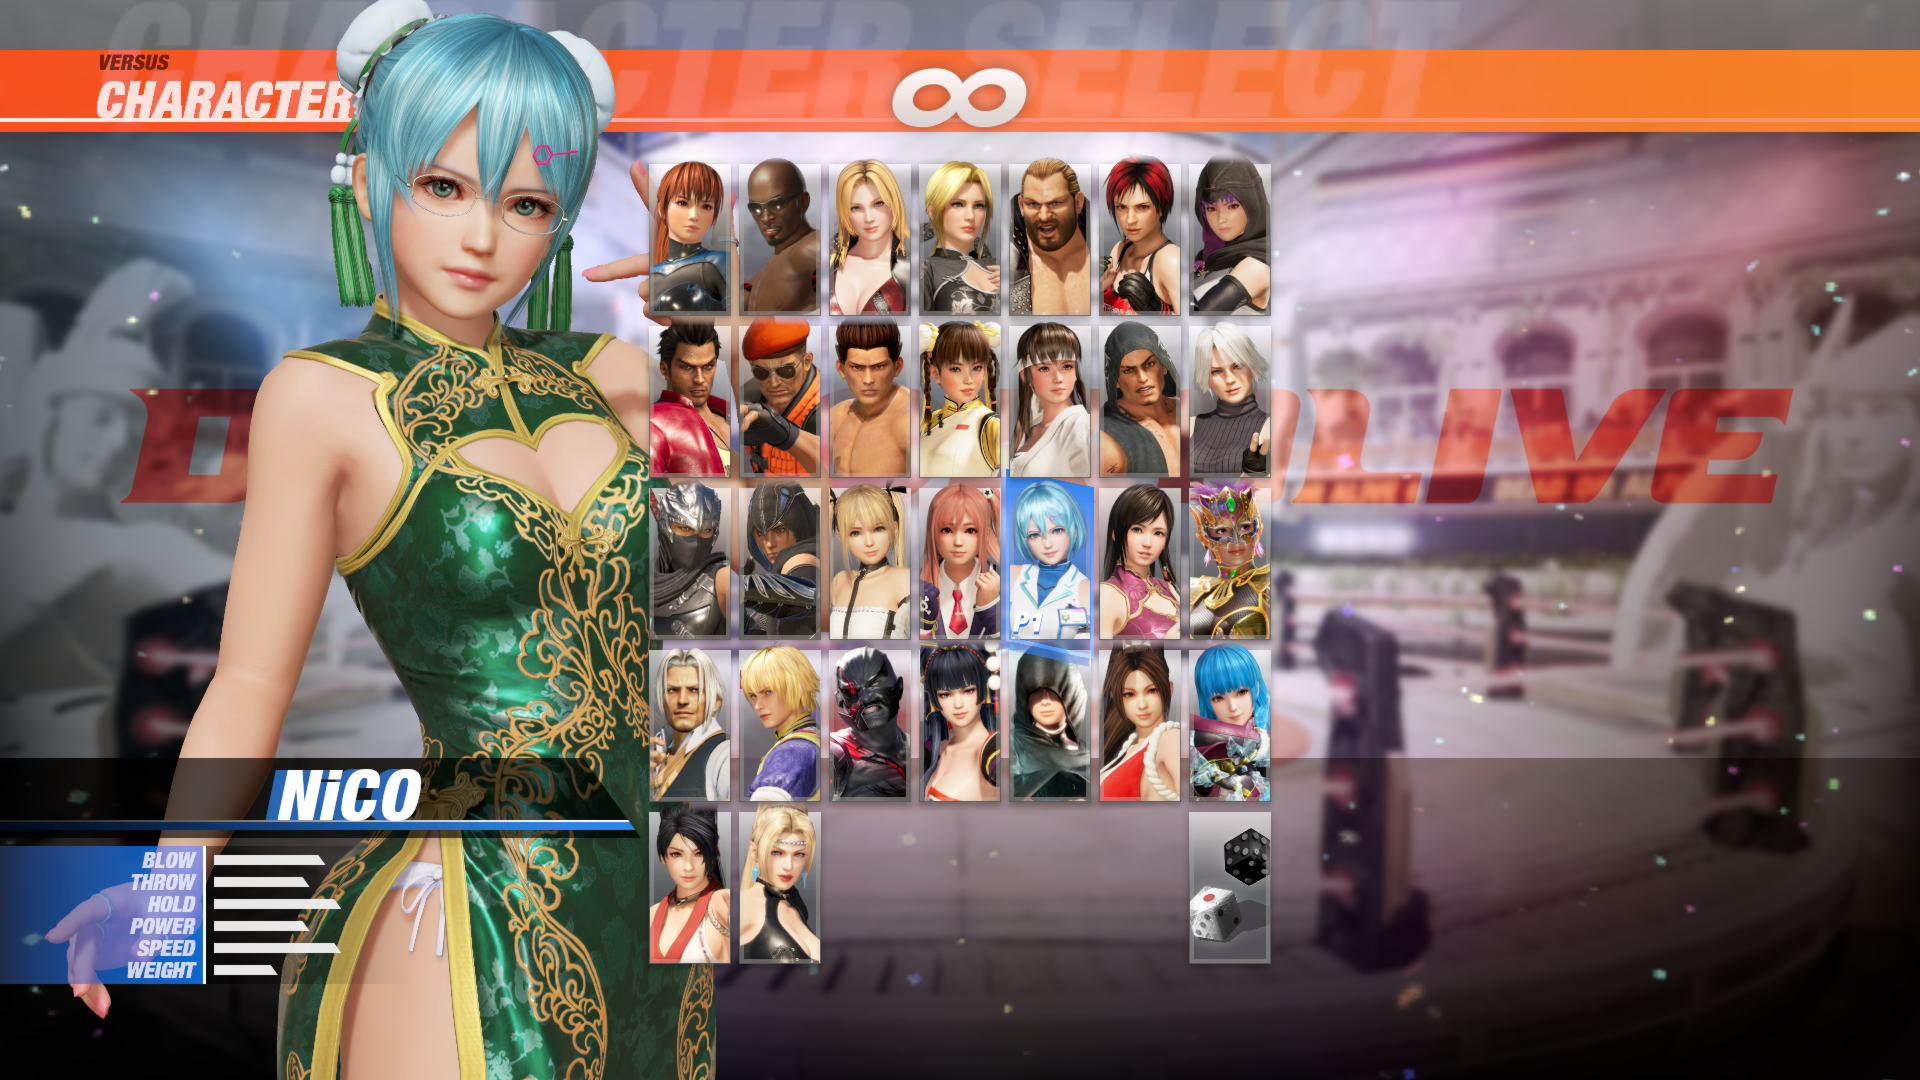 [Revival] DOA6 Alluring Mandarin Dress - NiCO screenshot